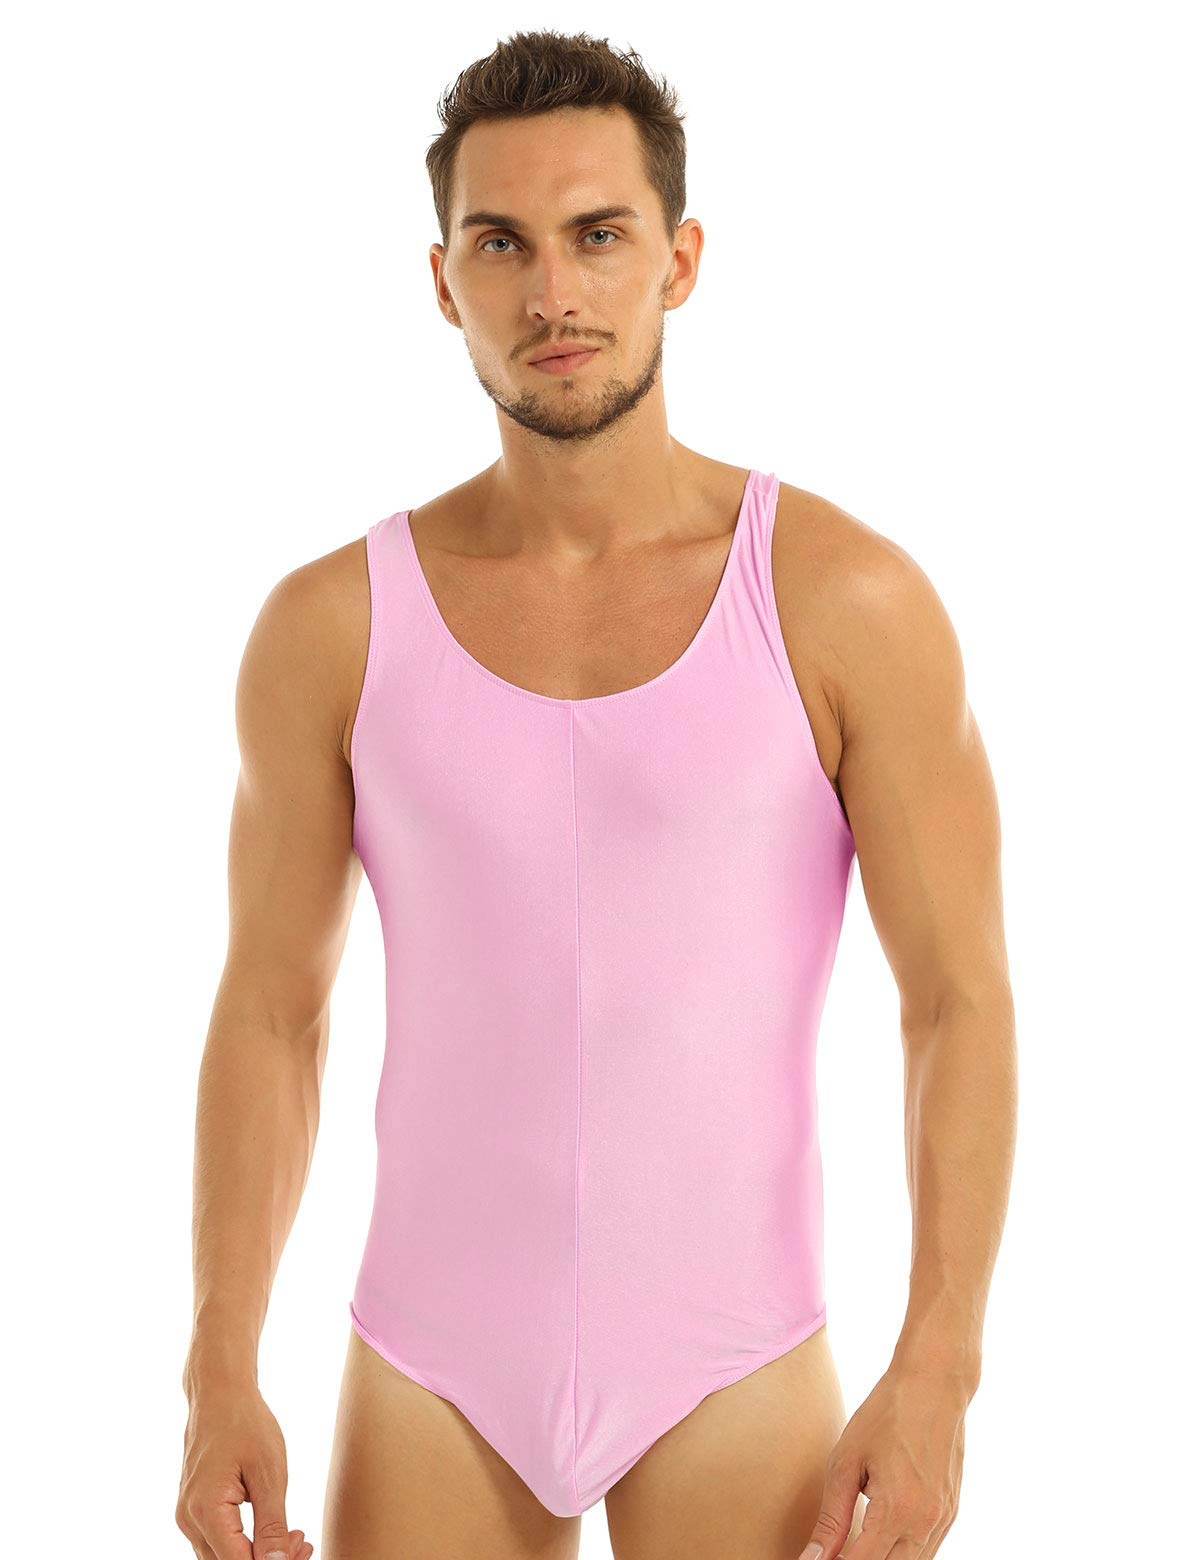 IEFIEL Mens Sleeveless Stretchy One Piece Bodysuit Sport Gym Workout Dancewear Biketard Tank Unitard Pink Leotard Medium by iEFiEL